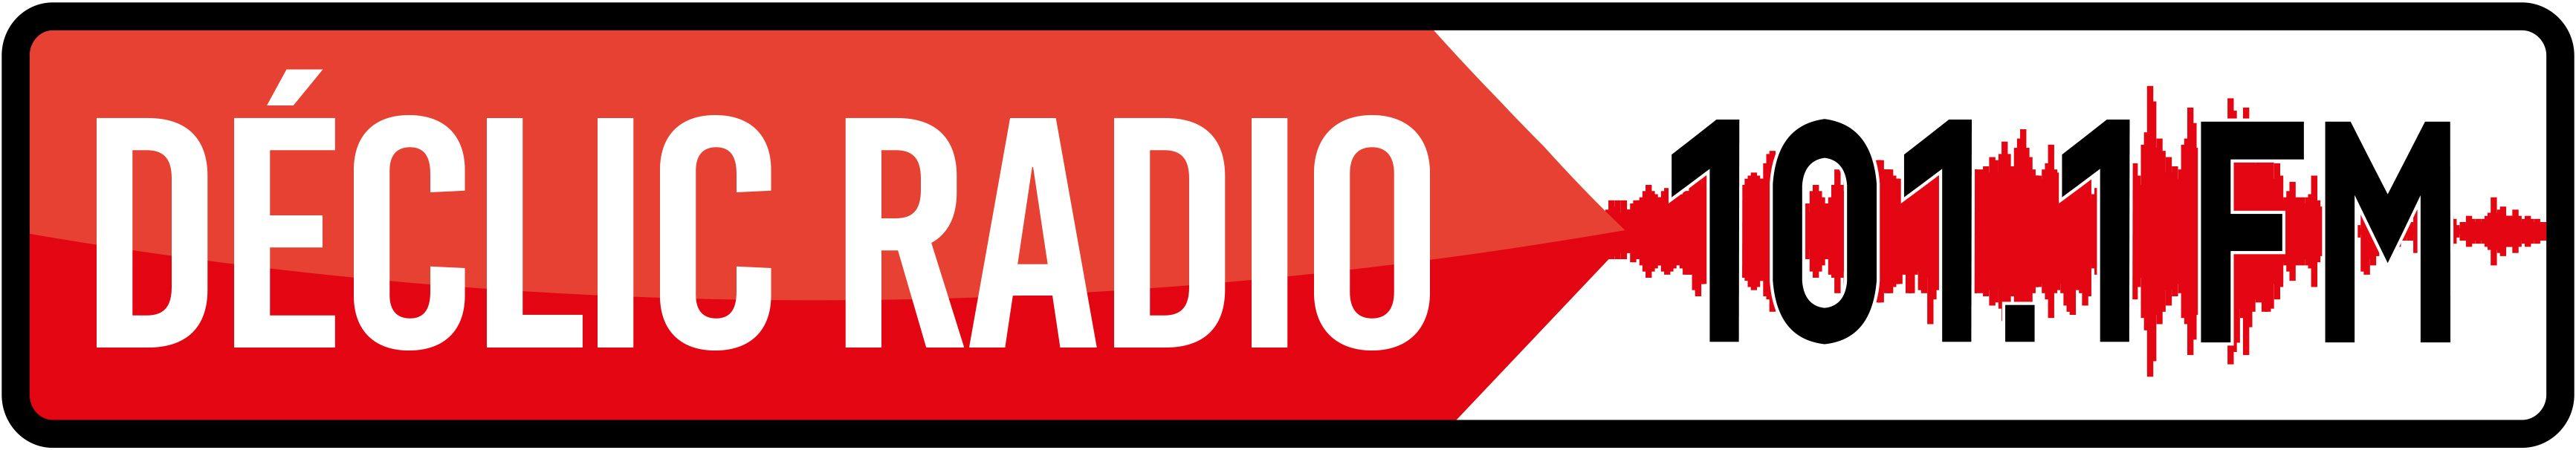 Declic radio